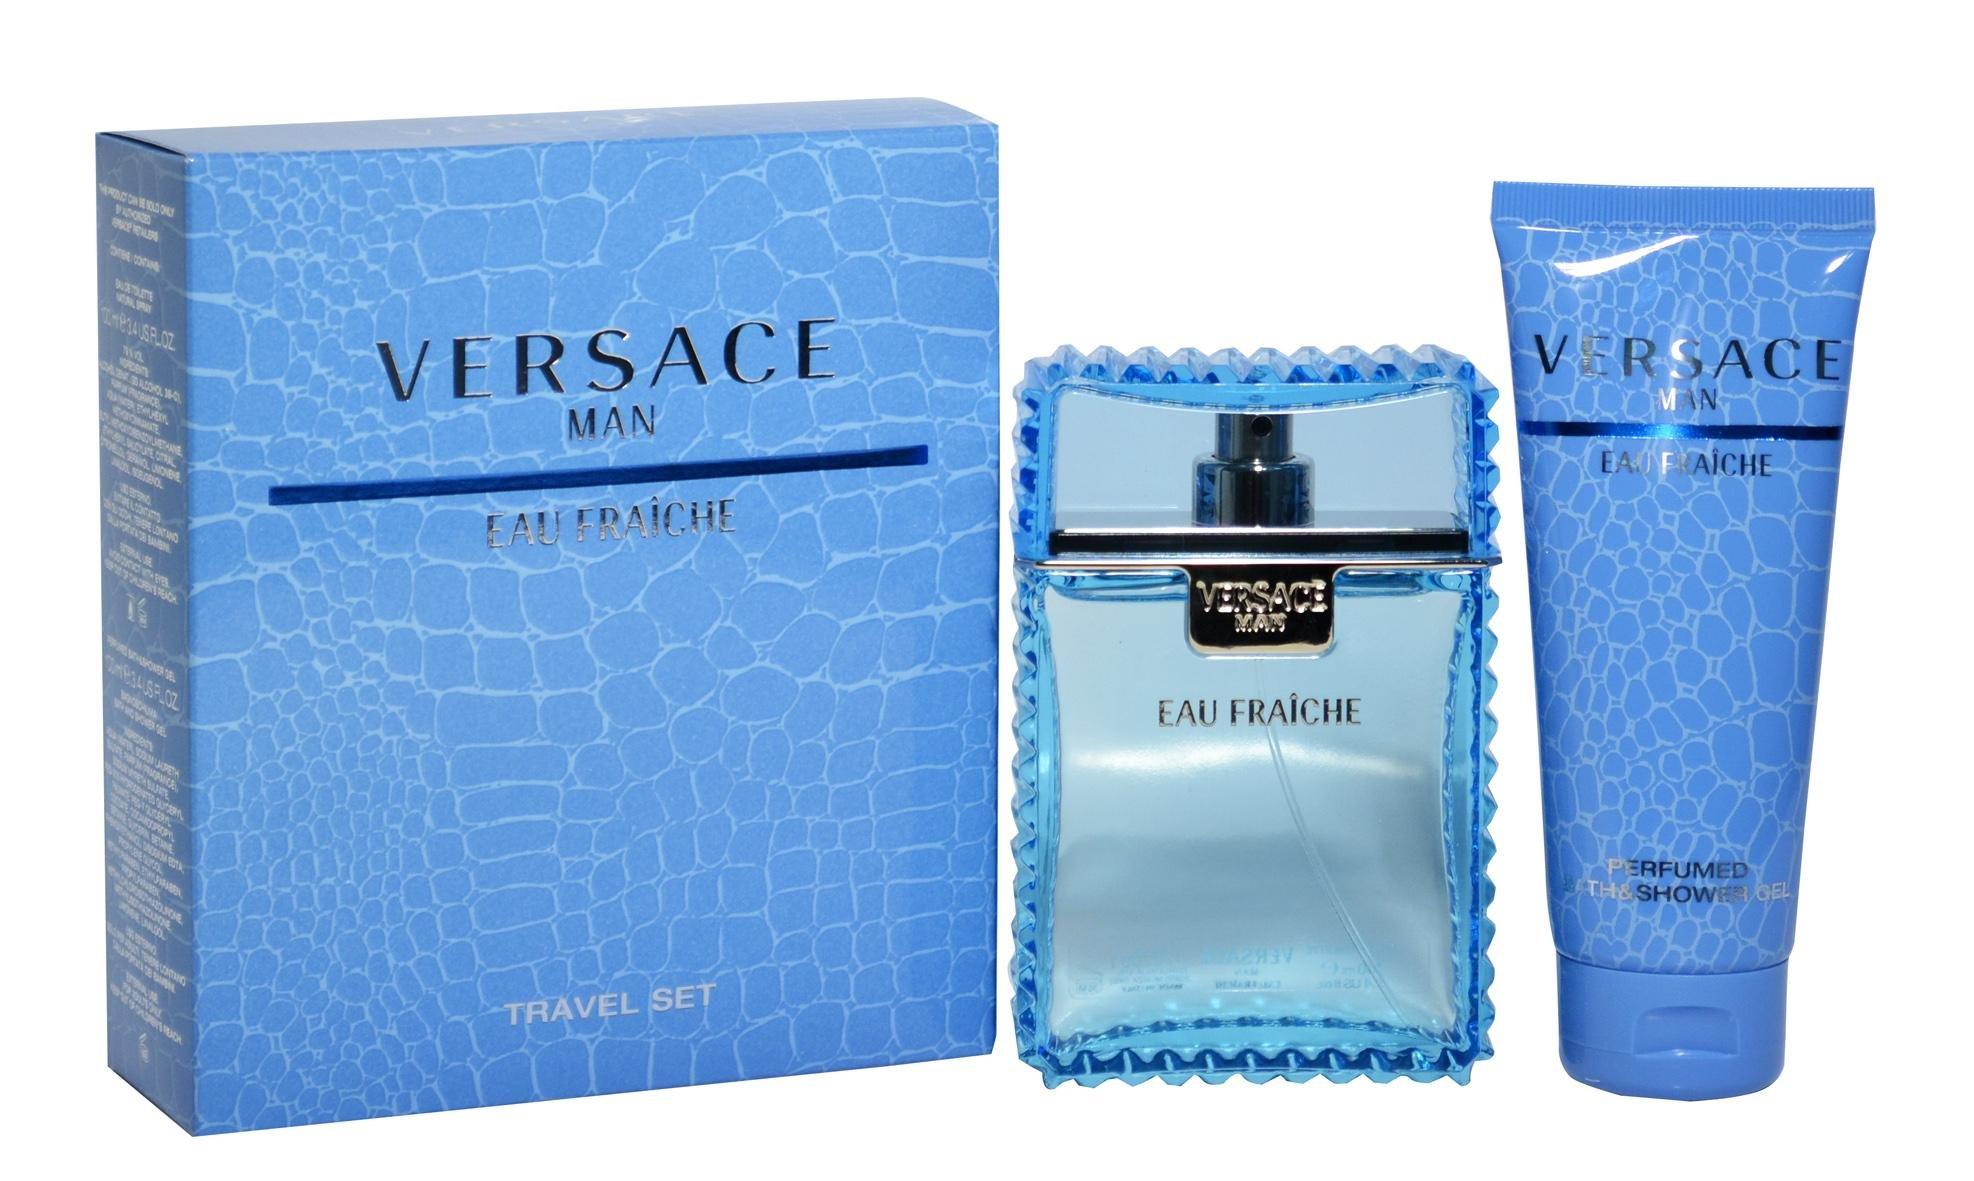 Versace Eau Fraiche Men Gift Set (Eau De Toilette Spray, Perfumed Bath and Shower Gel) by Versace